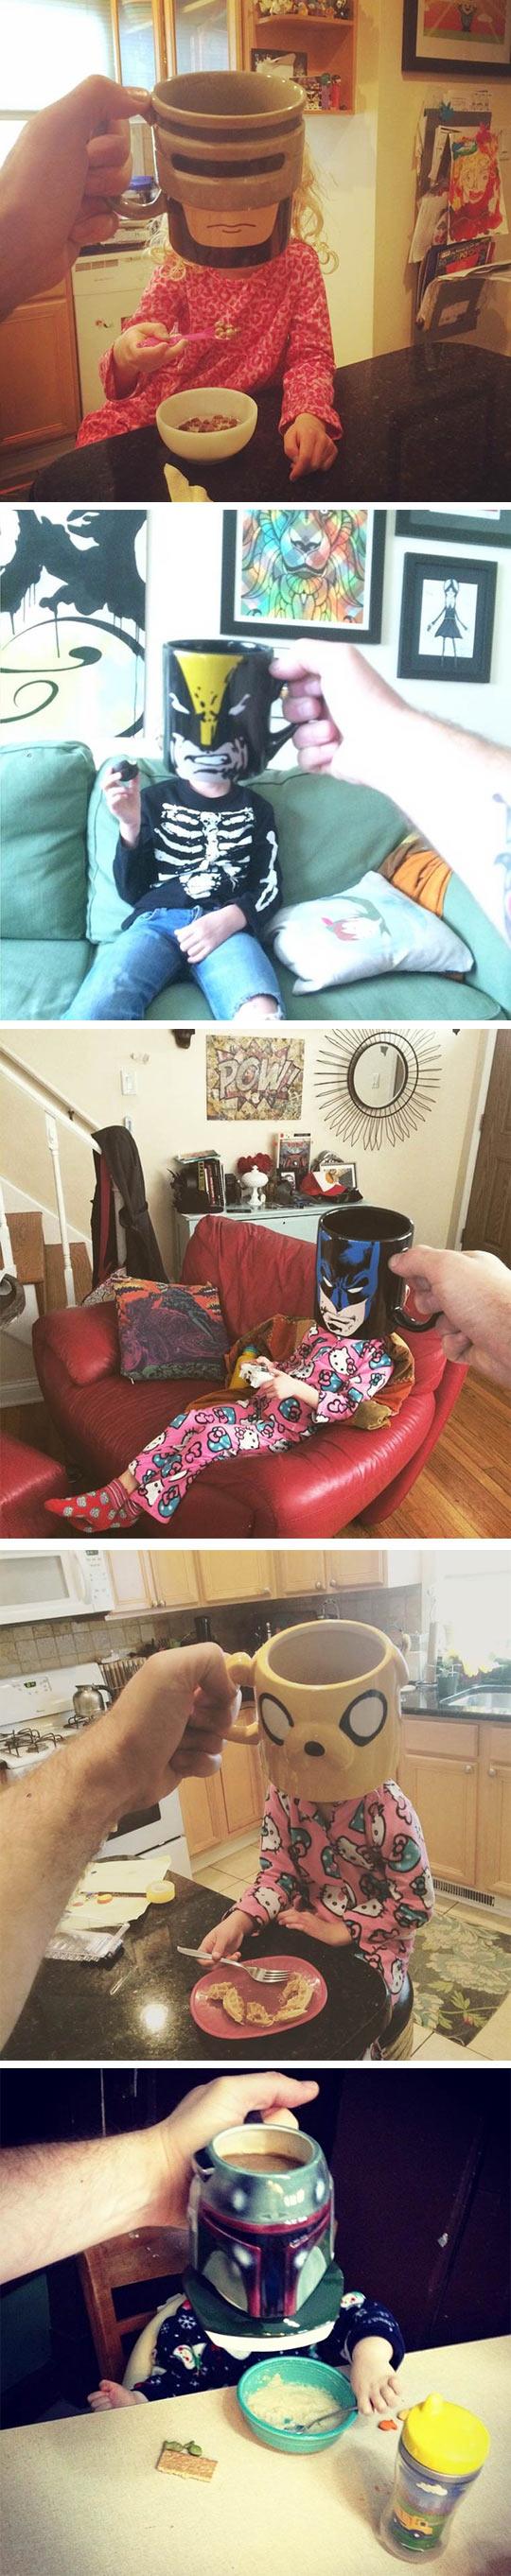 funny-kids-mugshots-mug-head